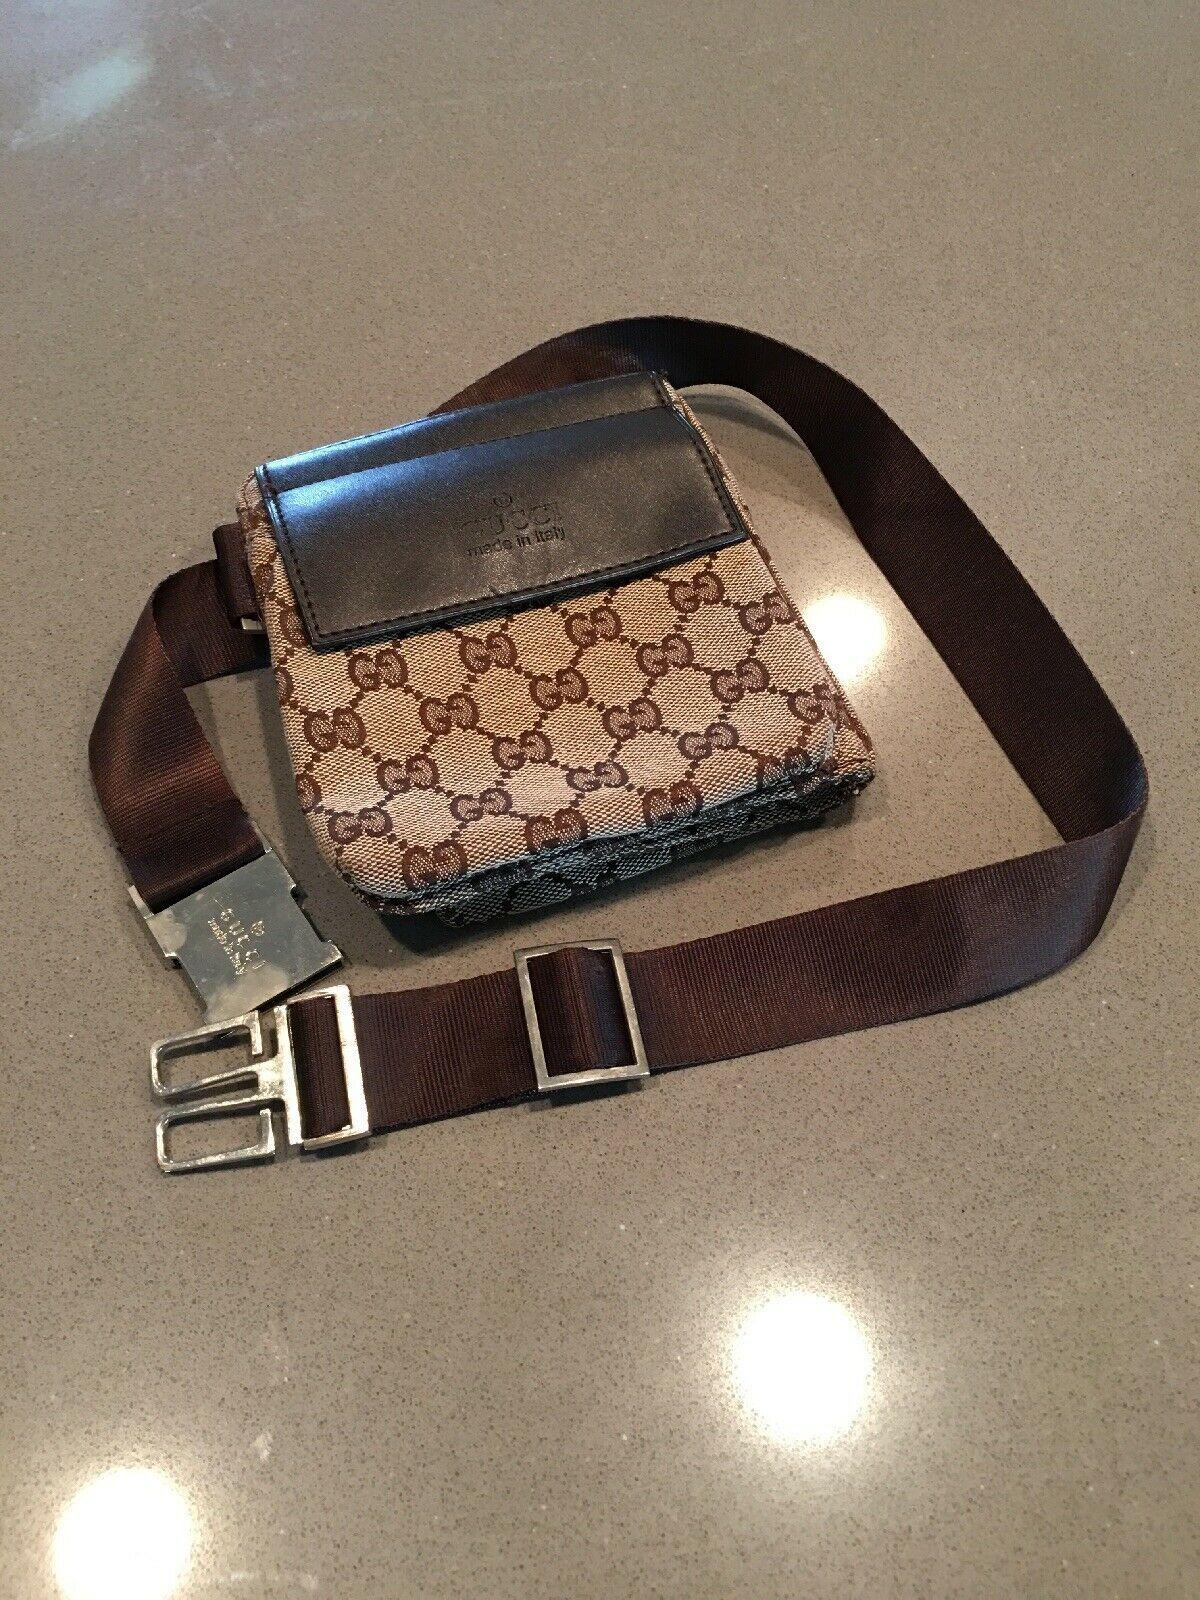 1a331fbf053d9 Gucci Waist Pouch Bumbag Belt Bag Fanny Pack Brown Monogram Canvas Gucci GG Canvas  Monogram Waist